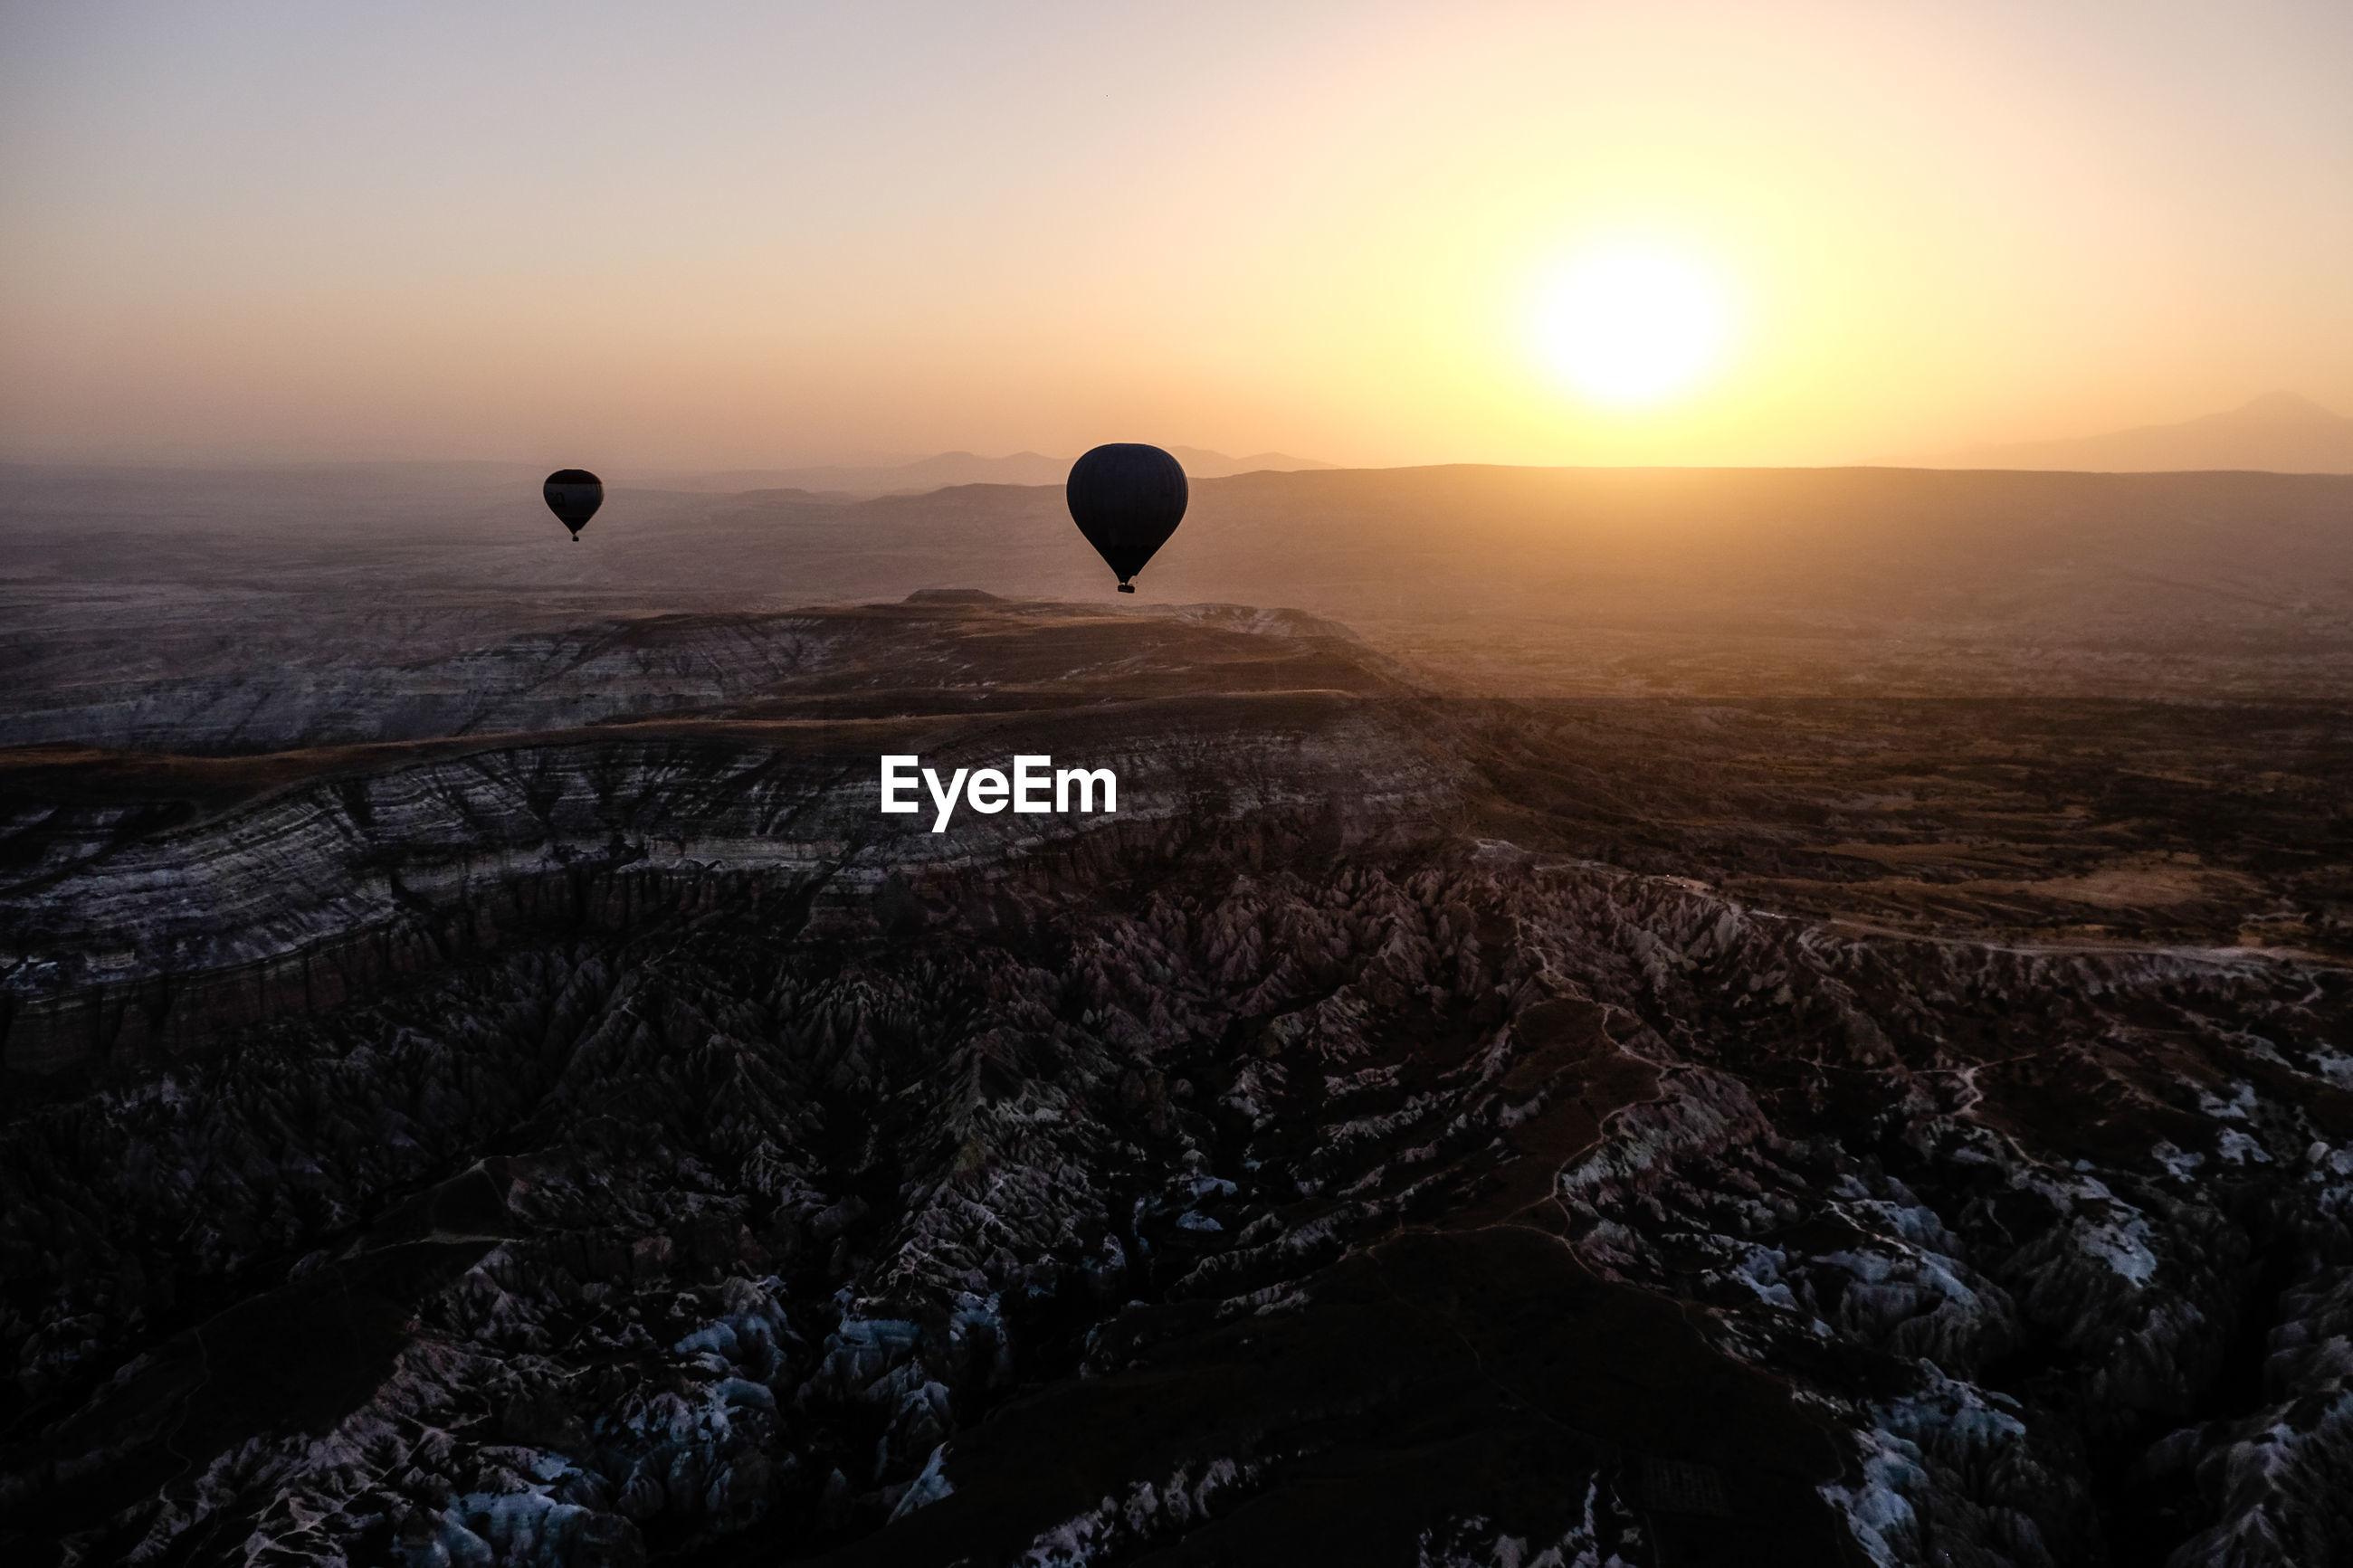 Hot air balloons flying over landscape against sky during sunrise